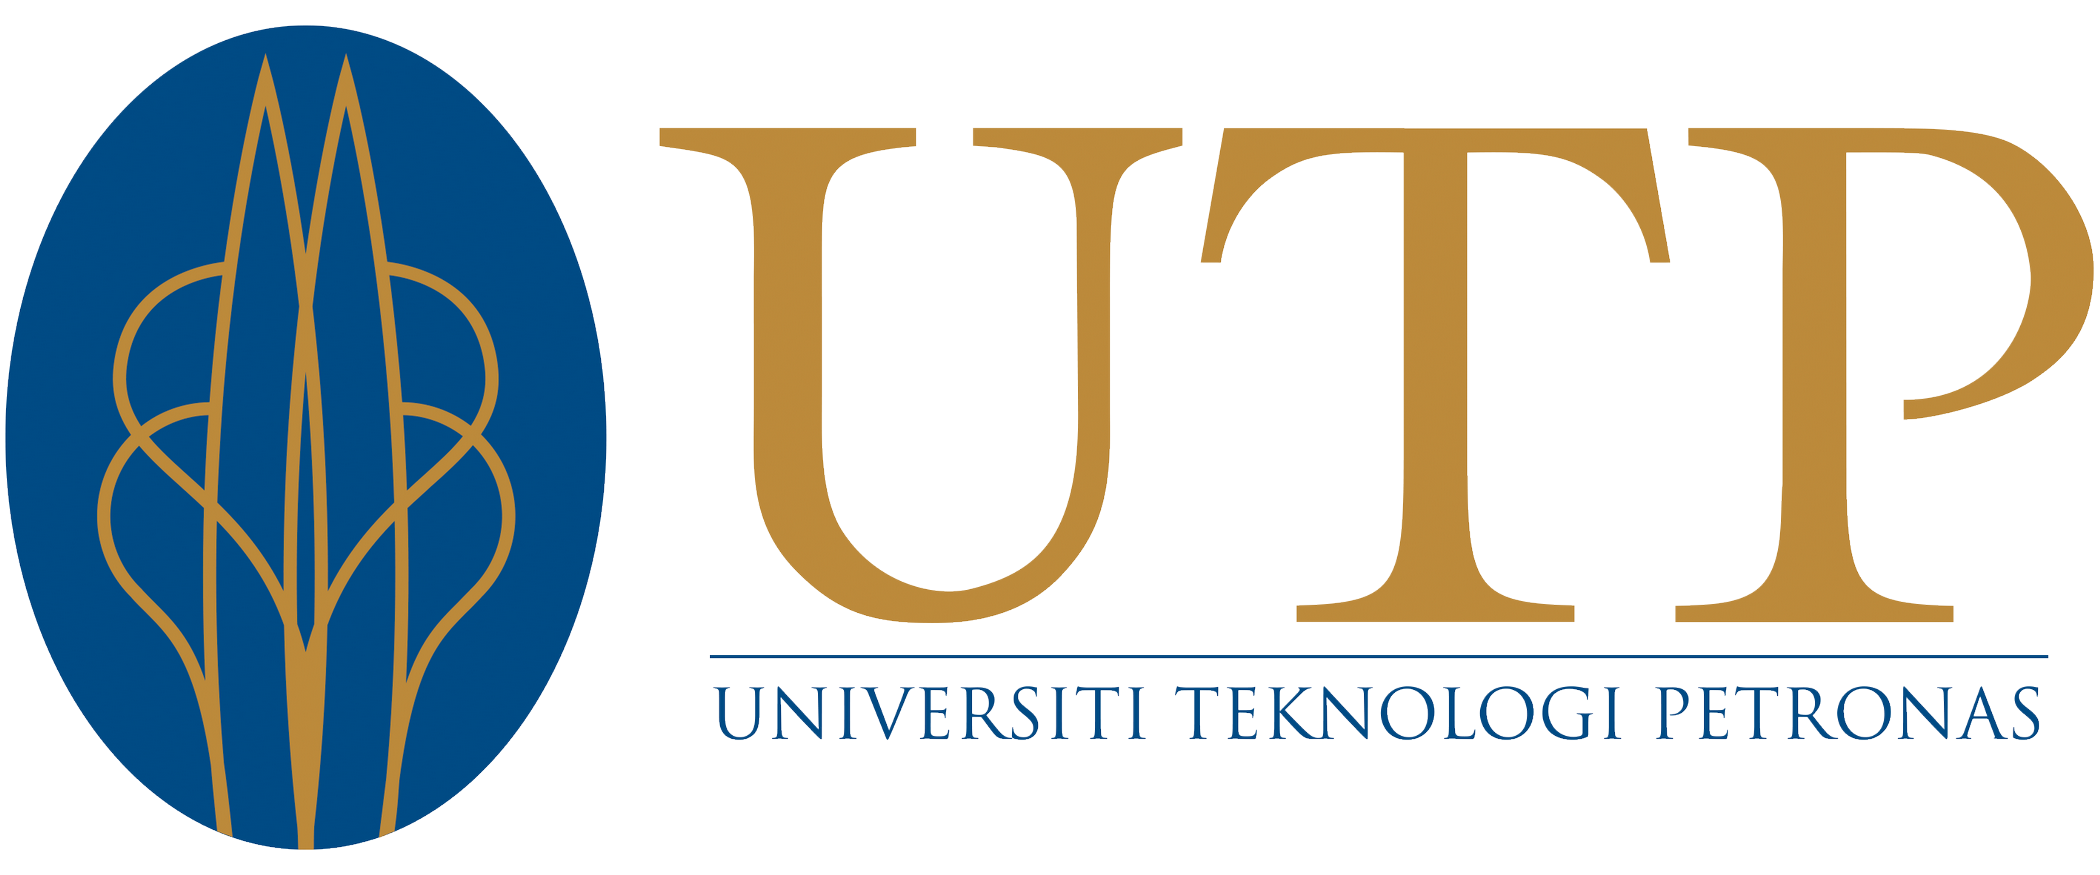 Utp logo universiti teknologi. Doctors clipart icon